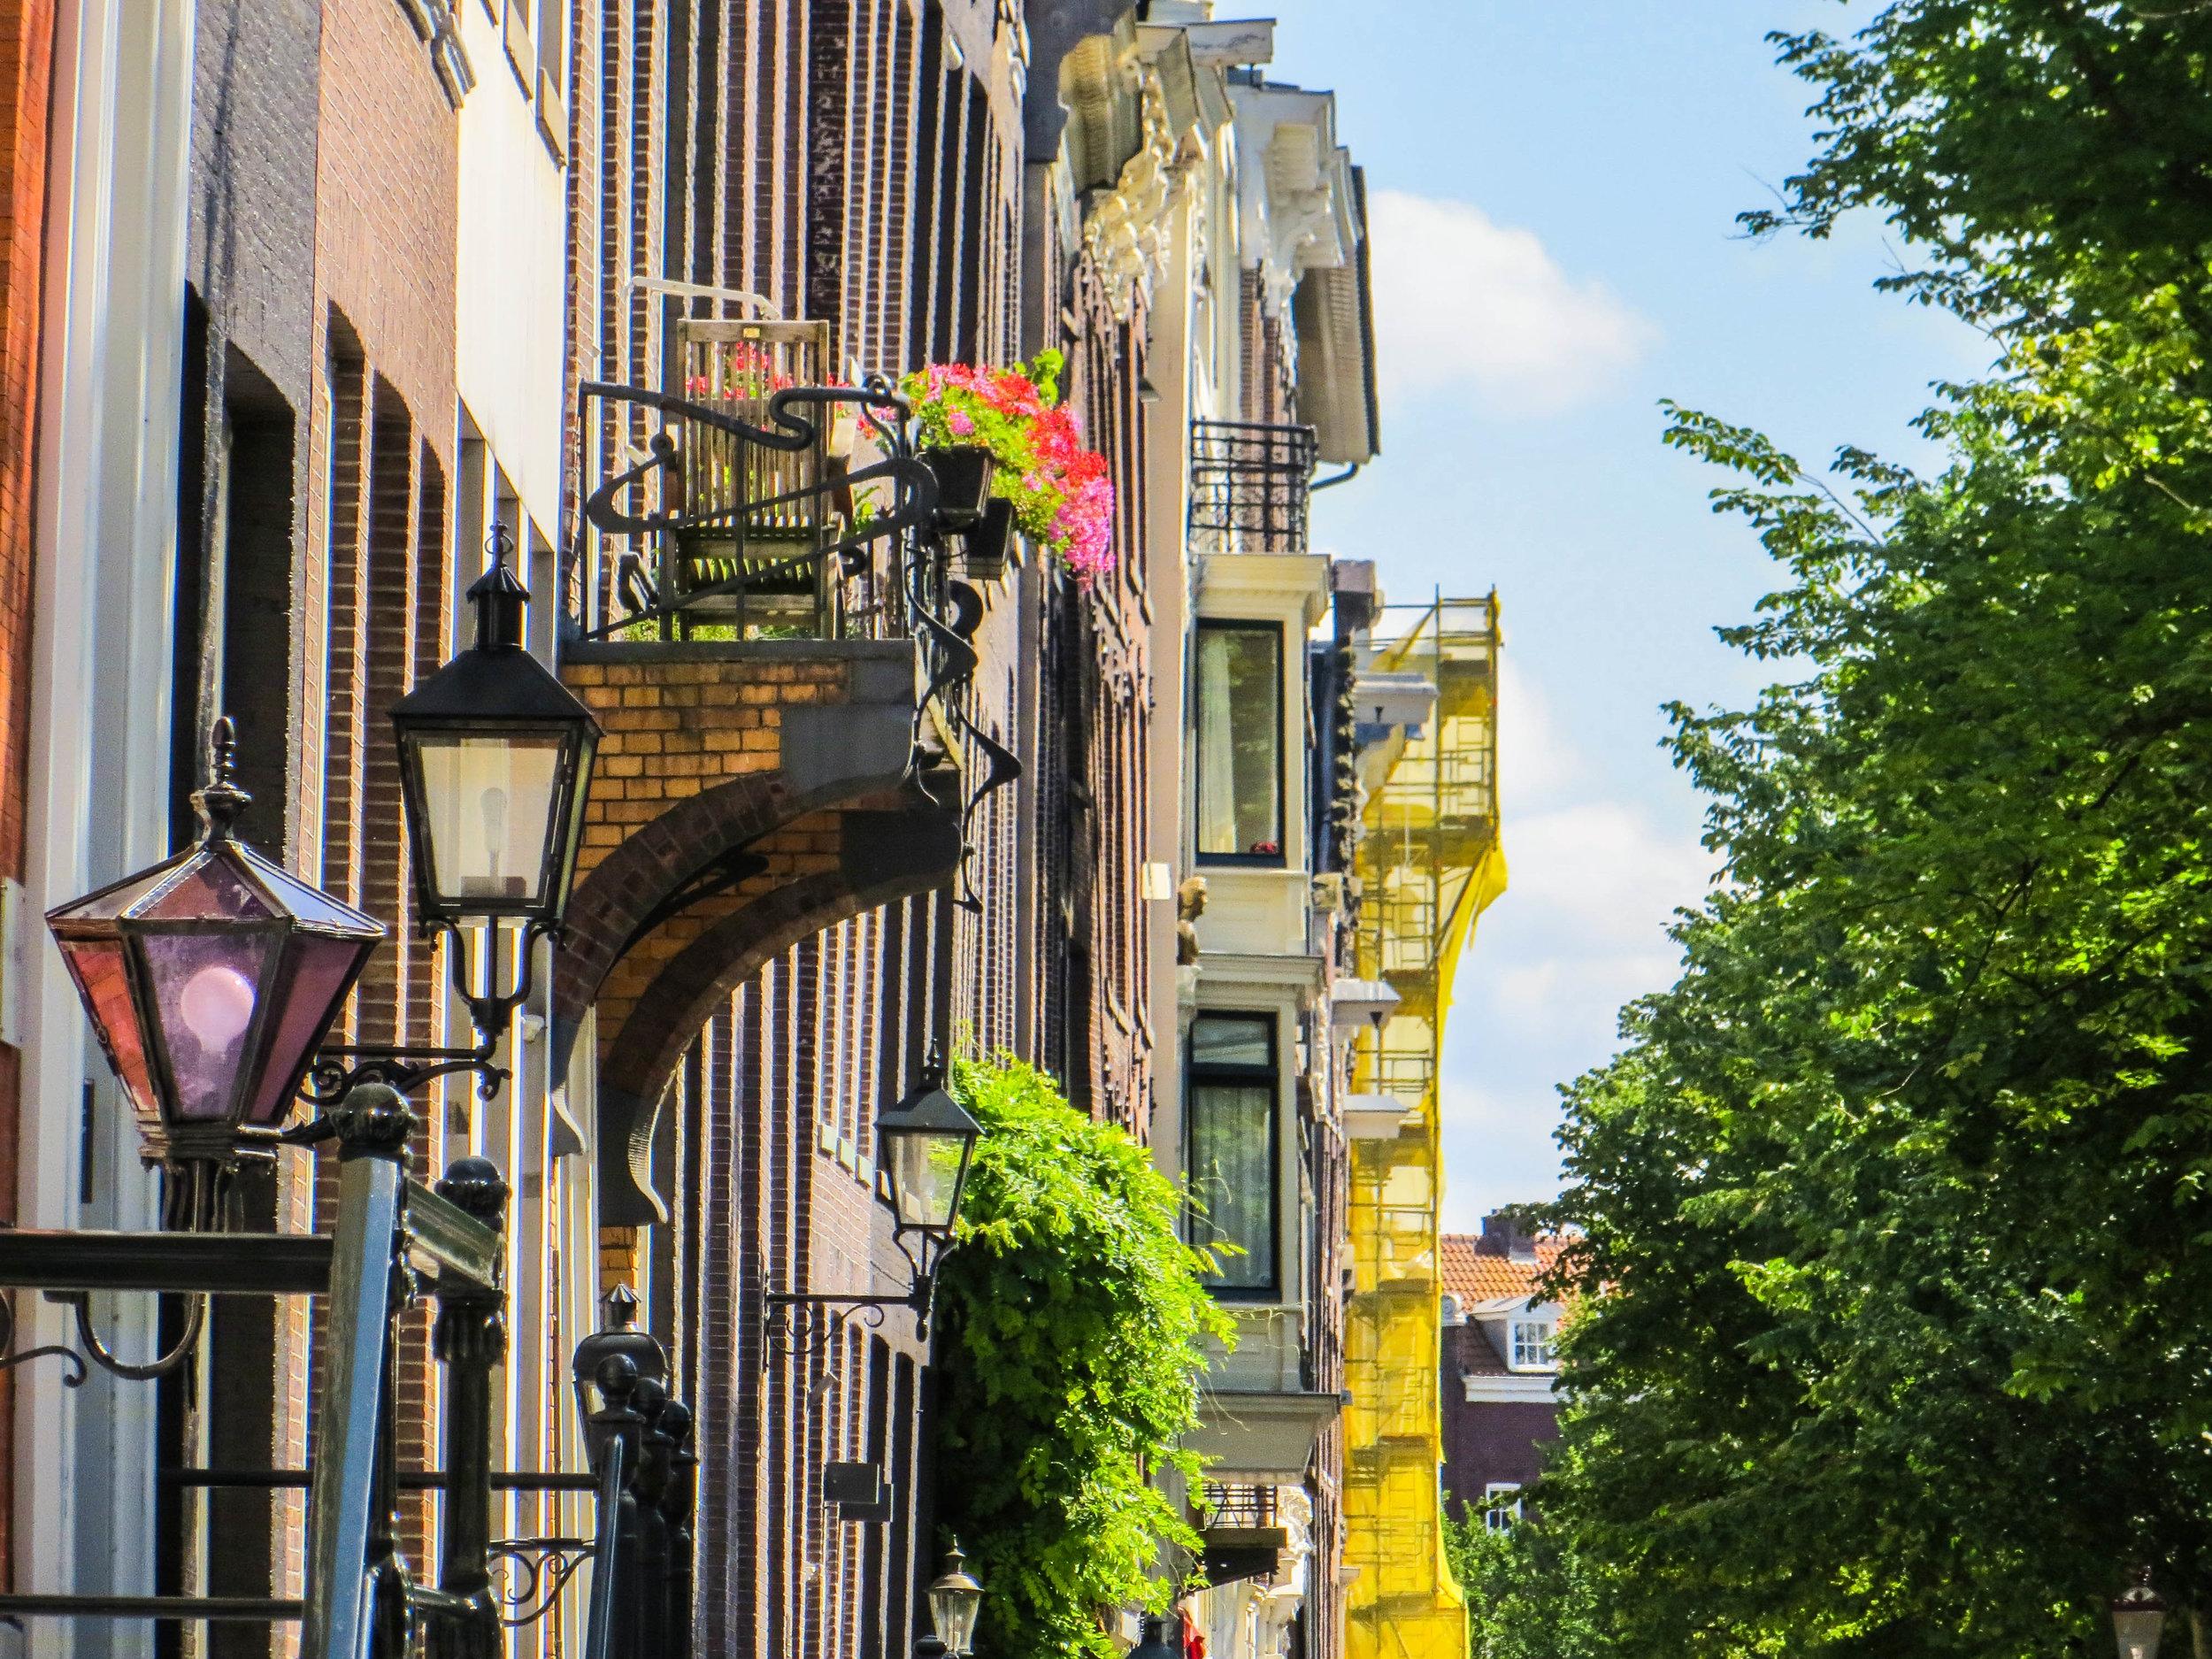 amsterdam-netherlands-street-photography-18.jpg